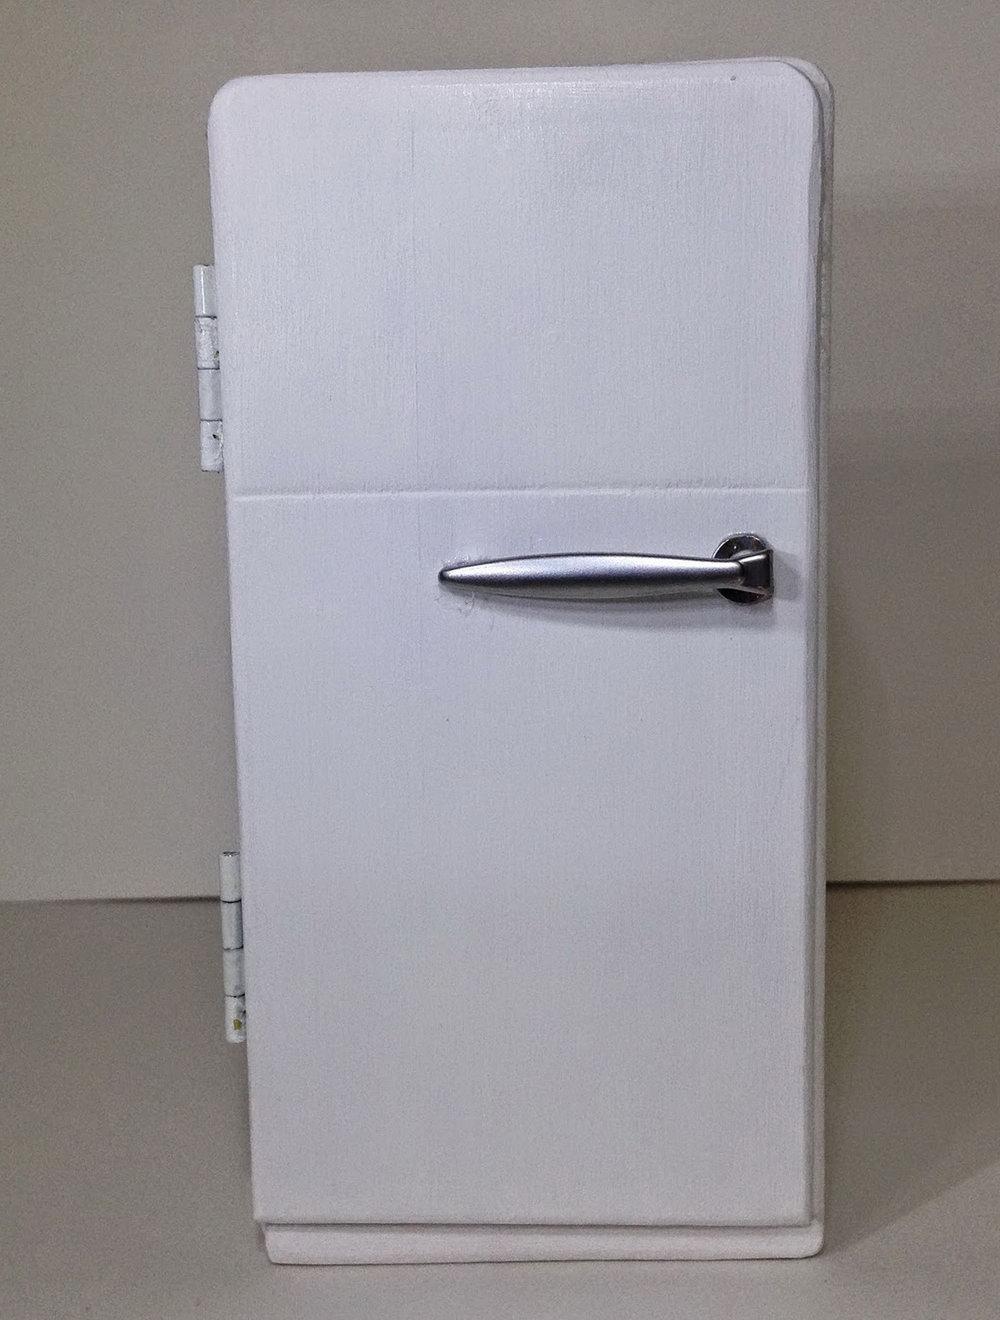 Magnetic Refrigerator Door Organizer